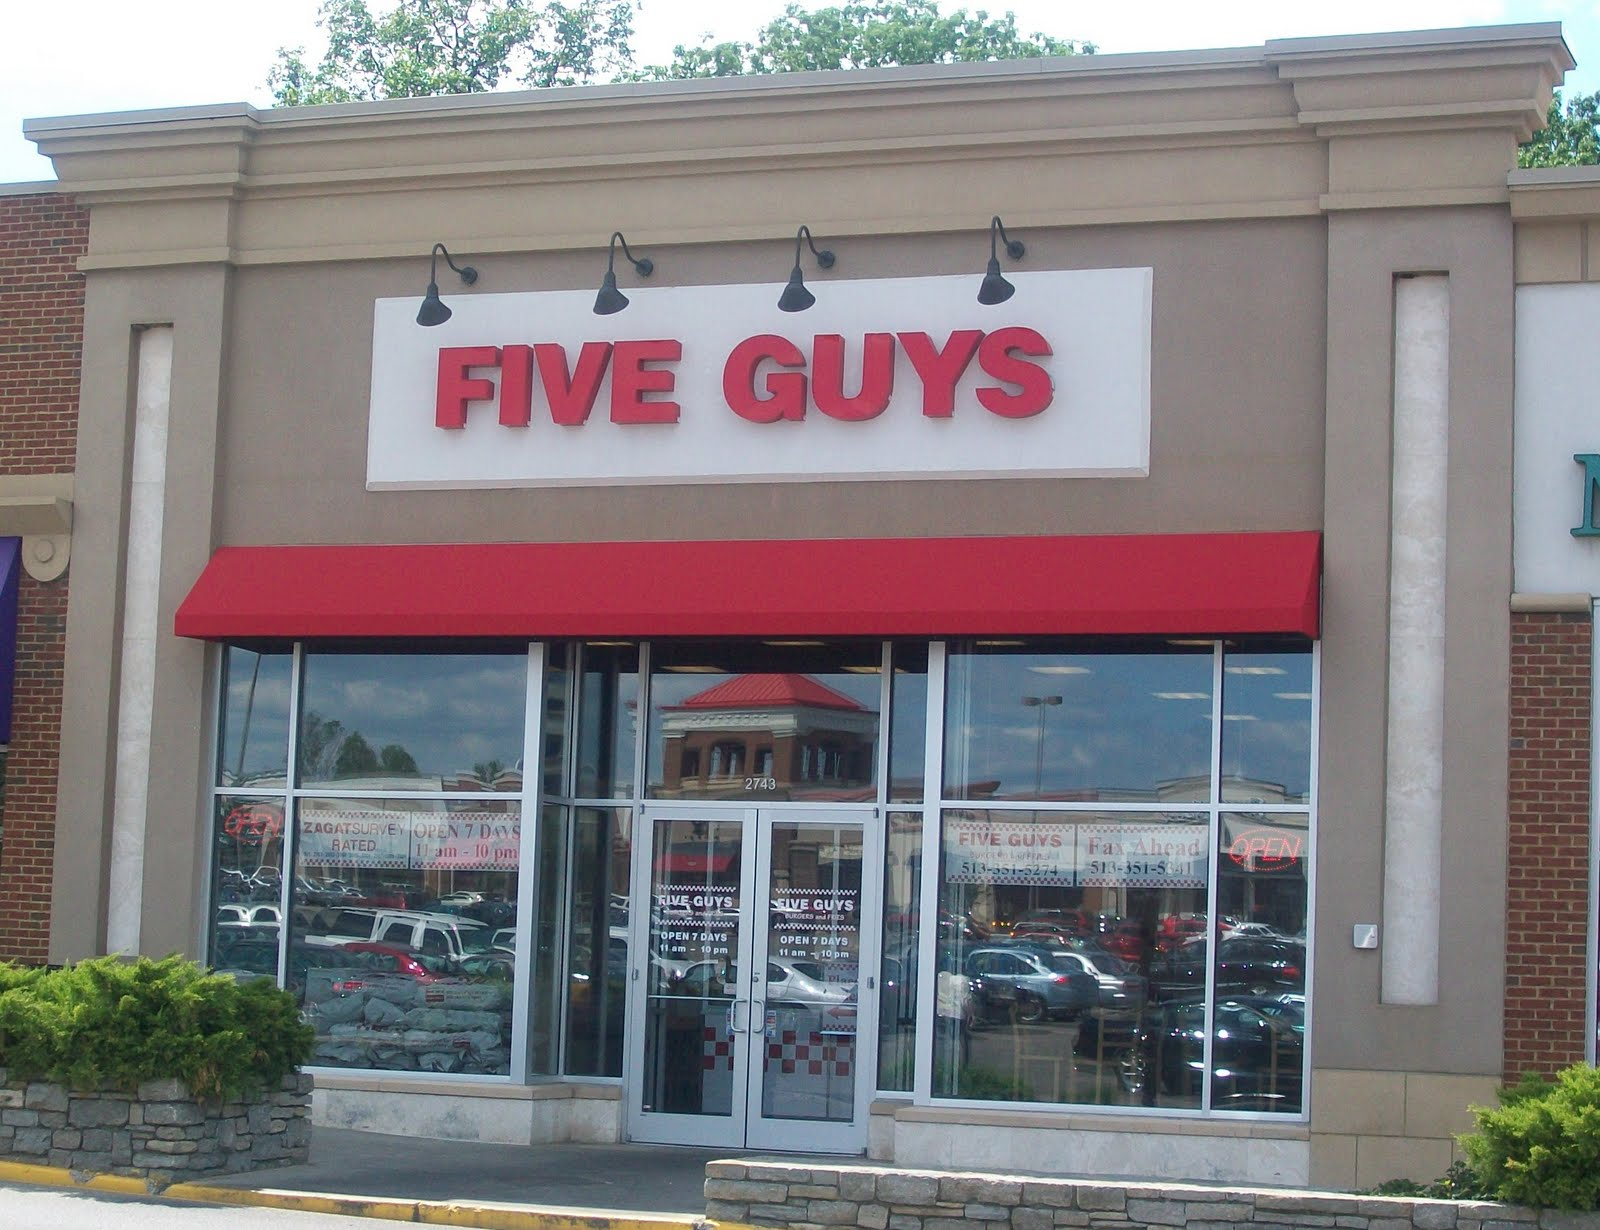 Finally - Five Guys!